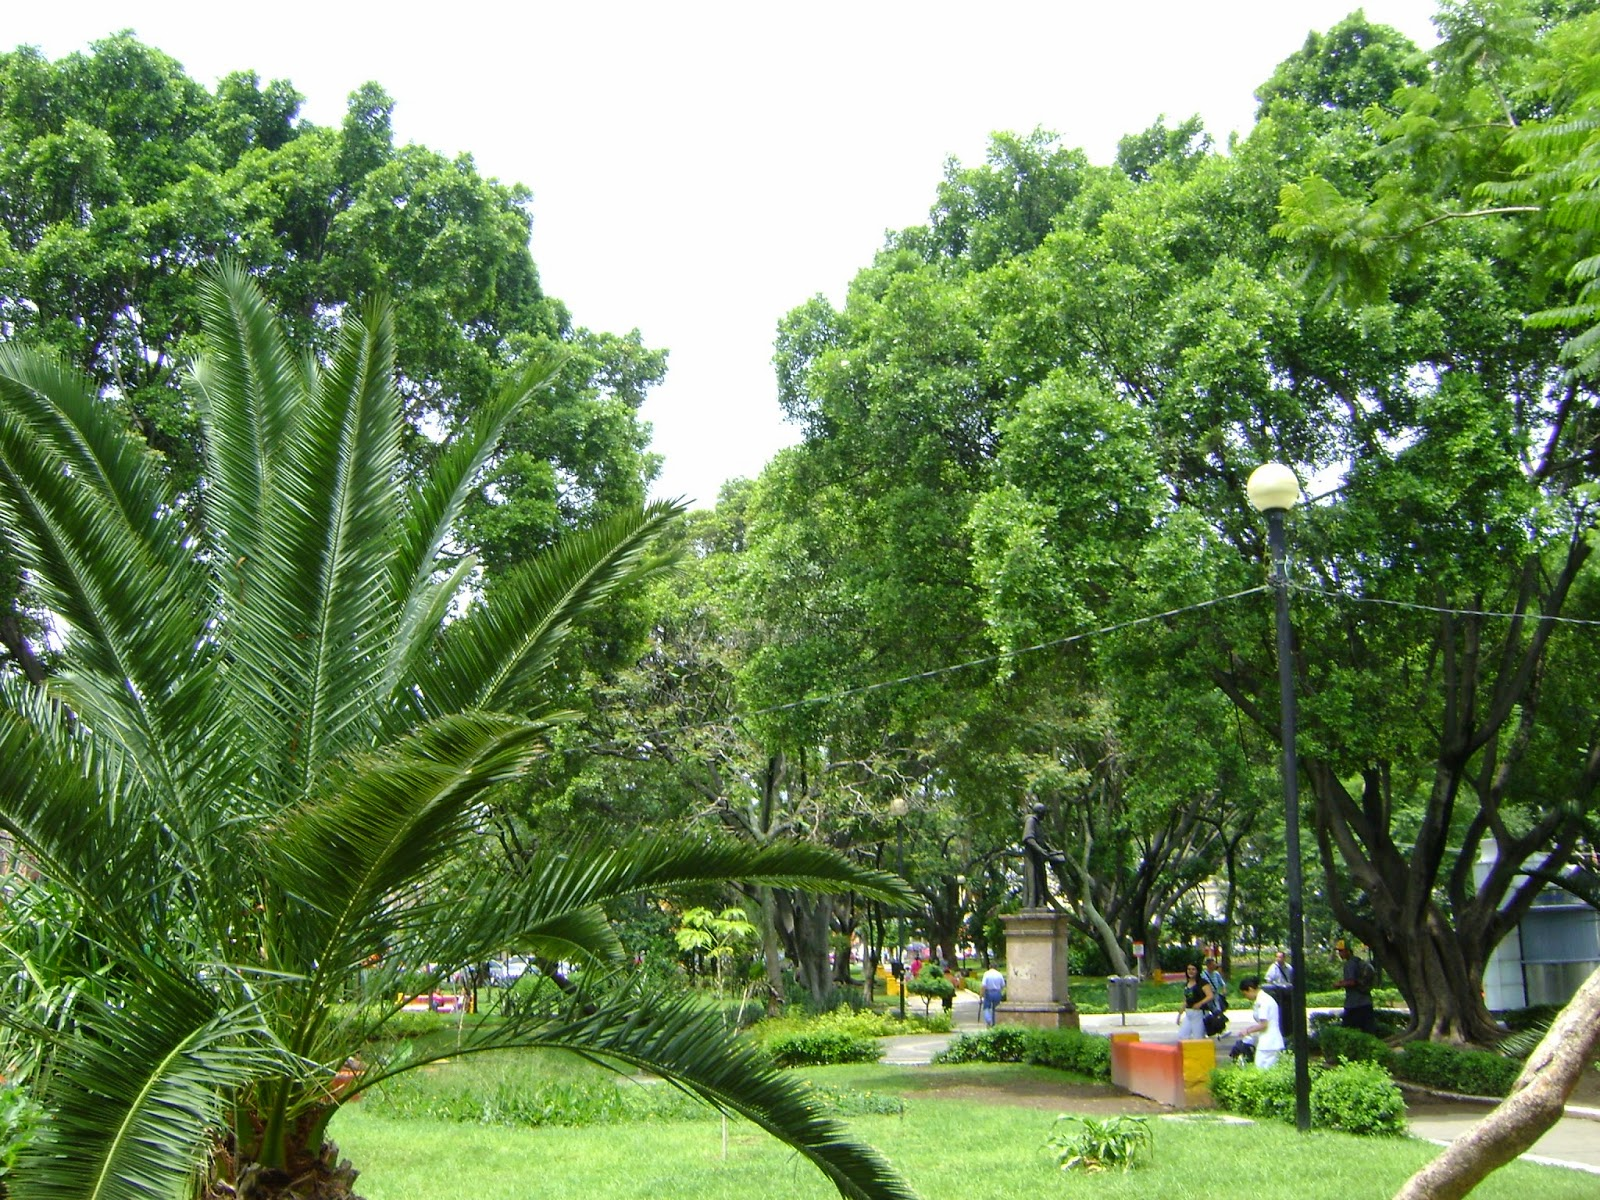 Sancarlosfortin jardin botanico jardin plaza alcalde en for Como ir al jardin botanico